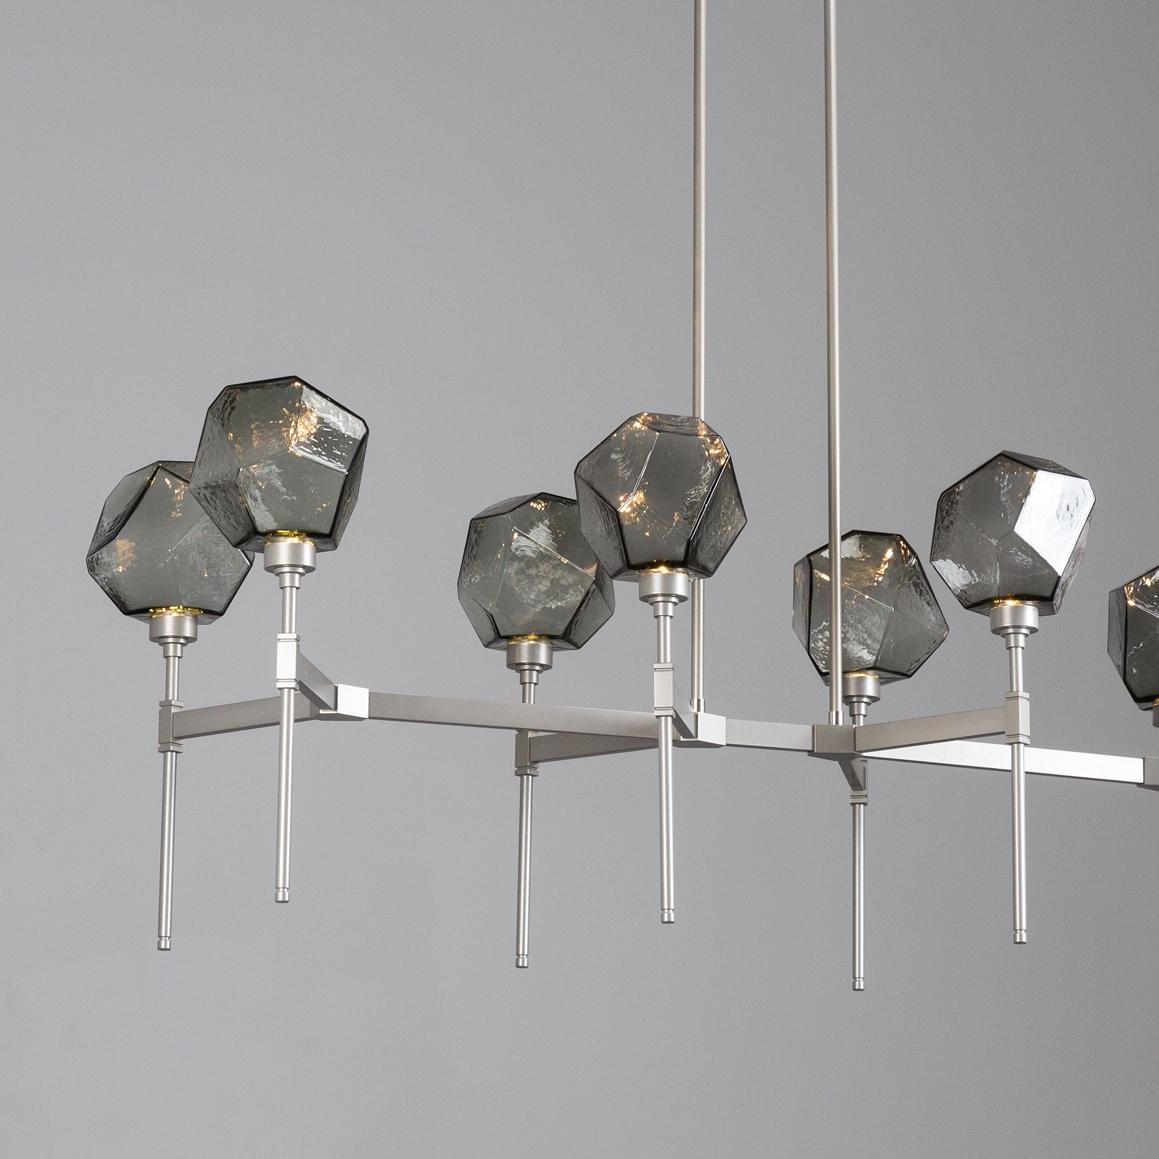 Metallic Beige Silver finish with smoke glass